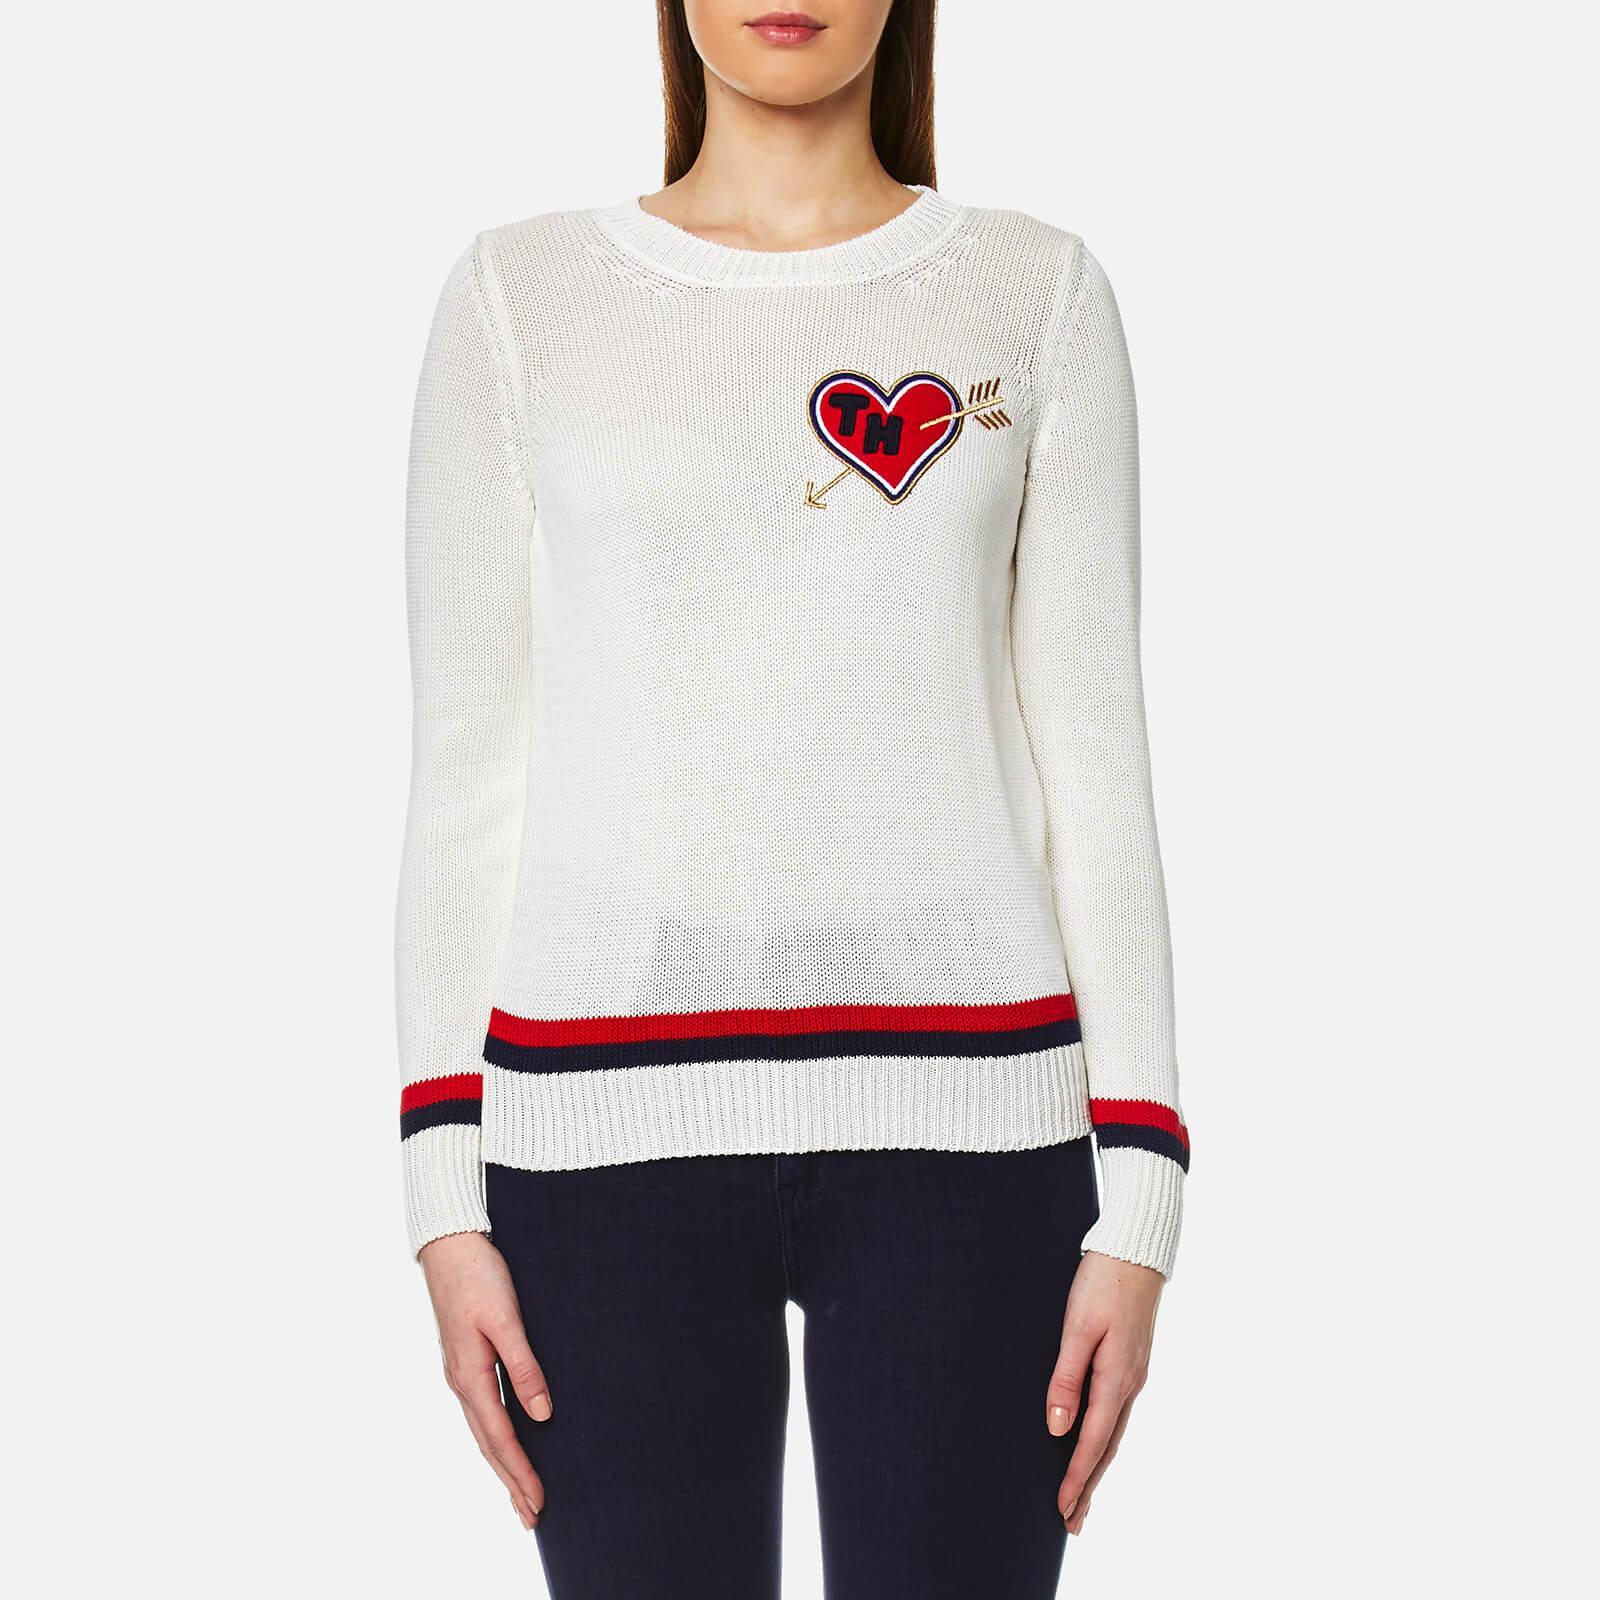 lyst tommy hilfiger estro tipping sweatshirt in white. Black Bedroom Furniture Sets. Home Design Ideas